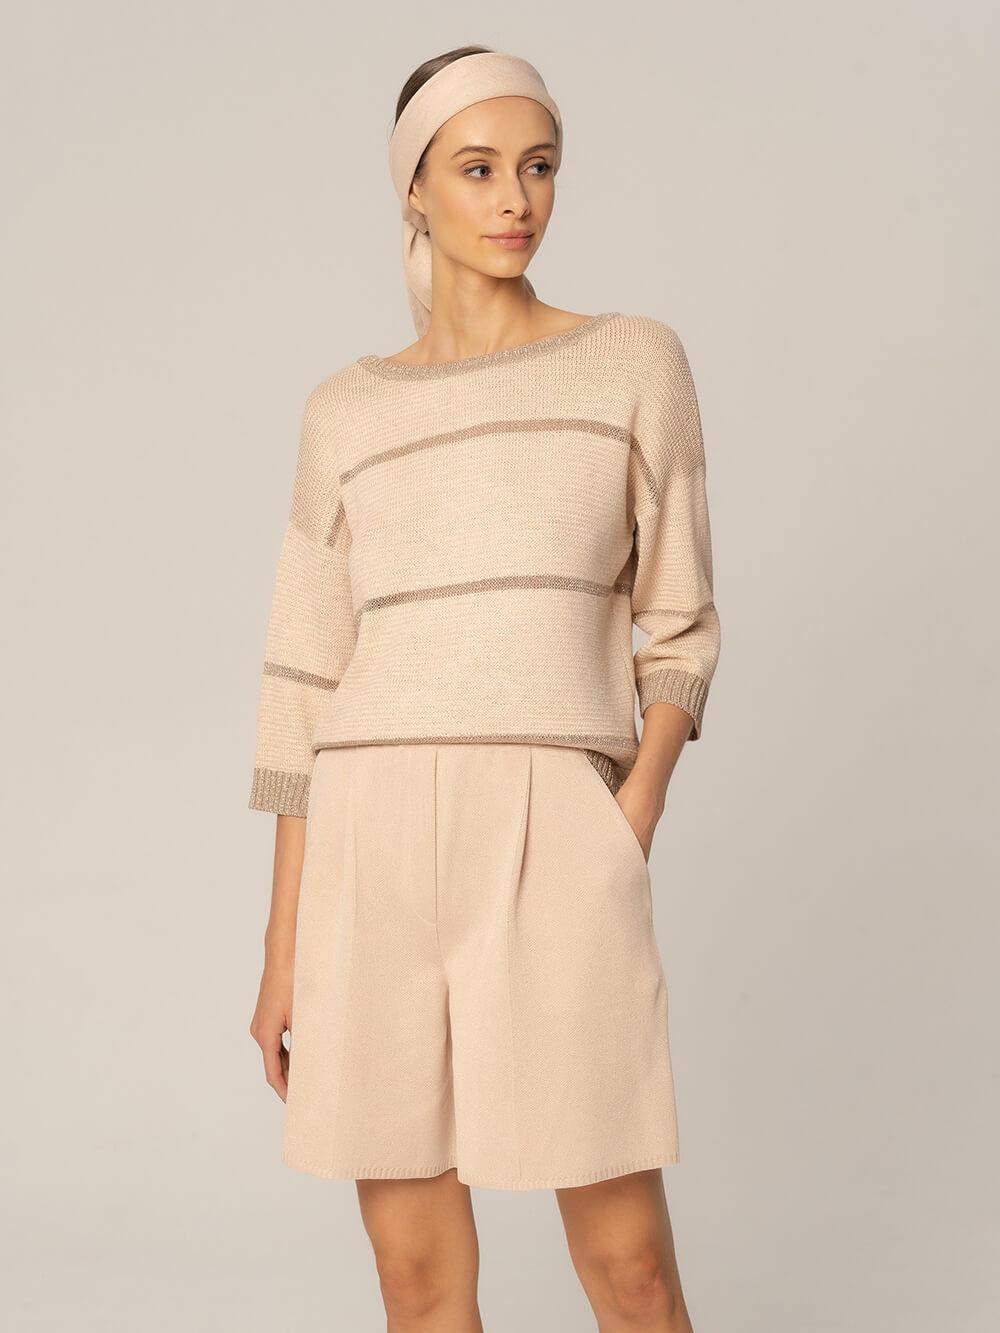 Женские шорты бежевого цвета из вискозы - фото 1